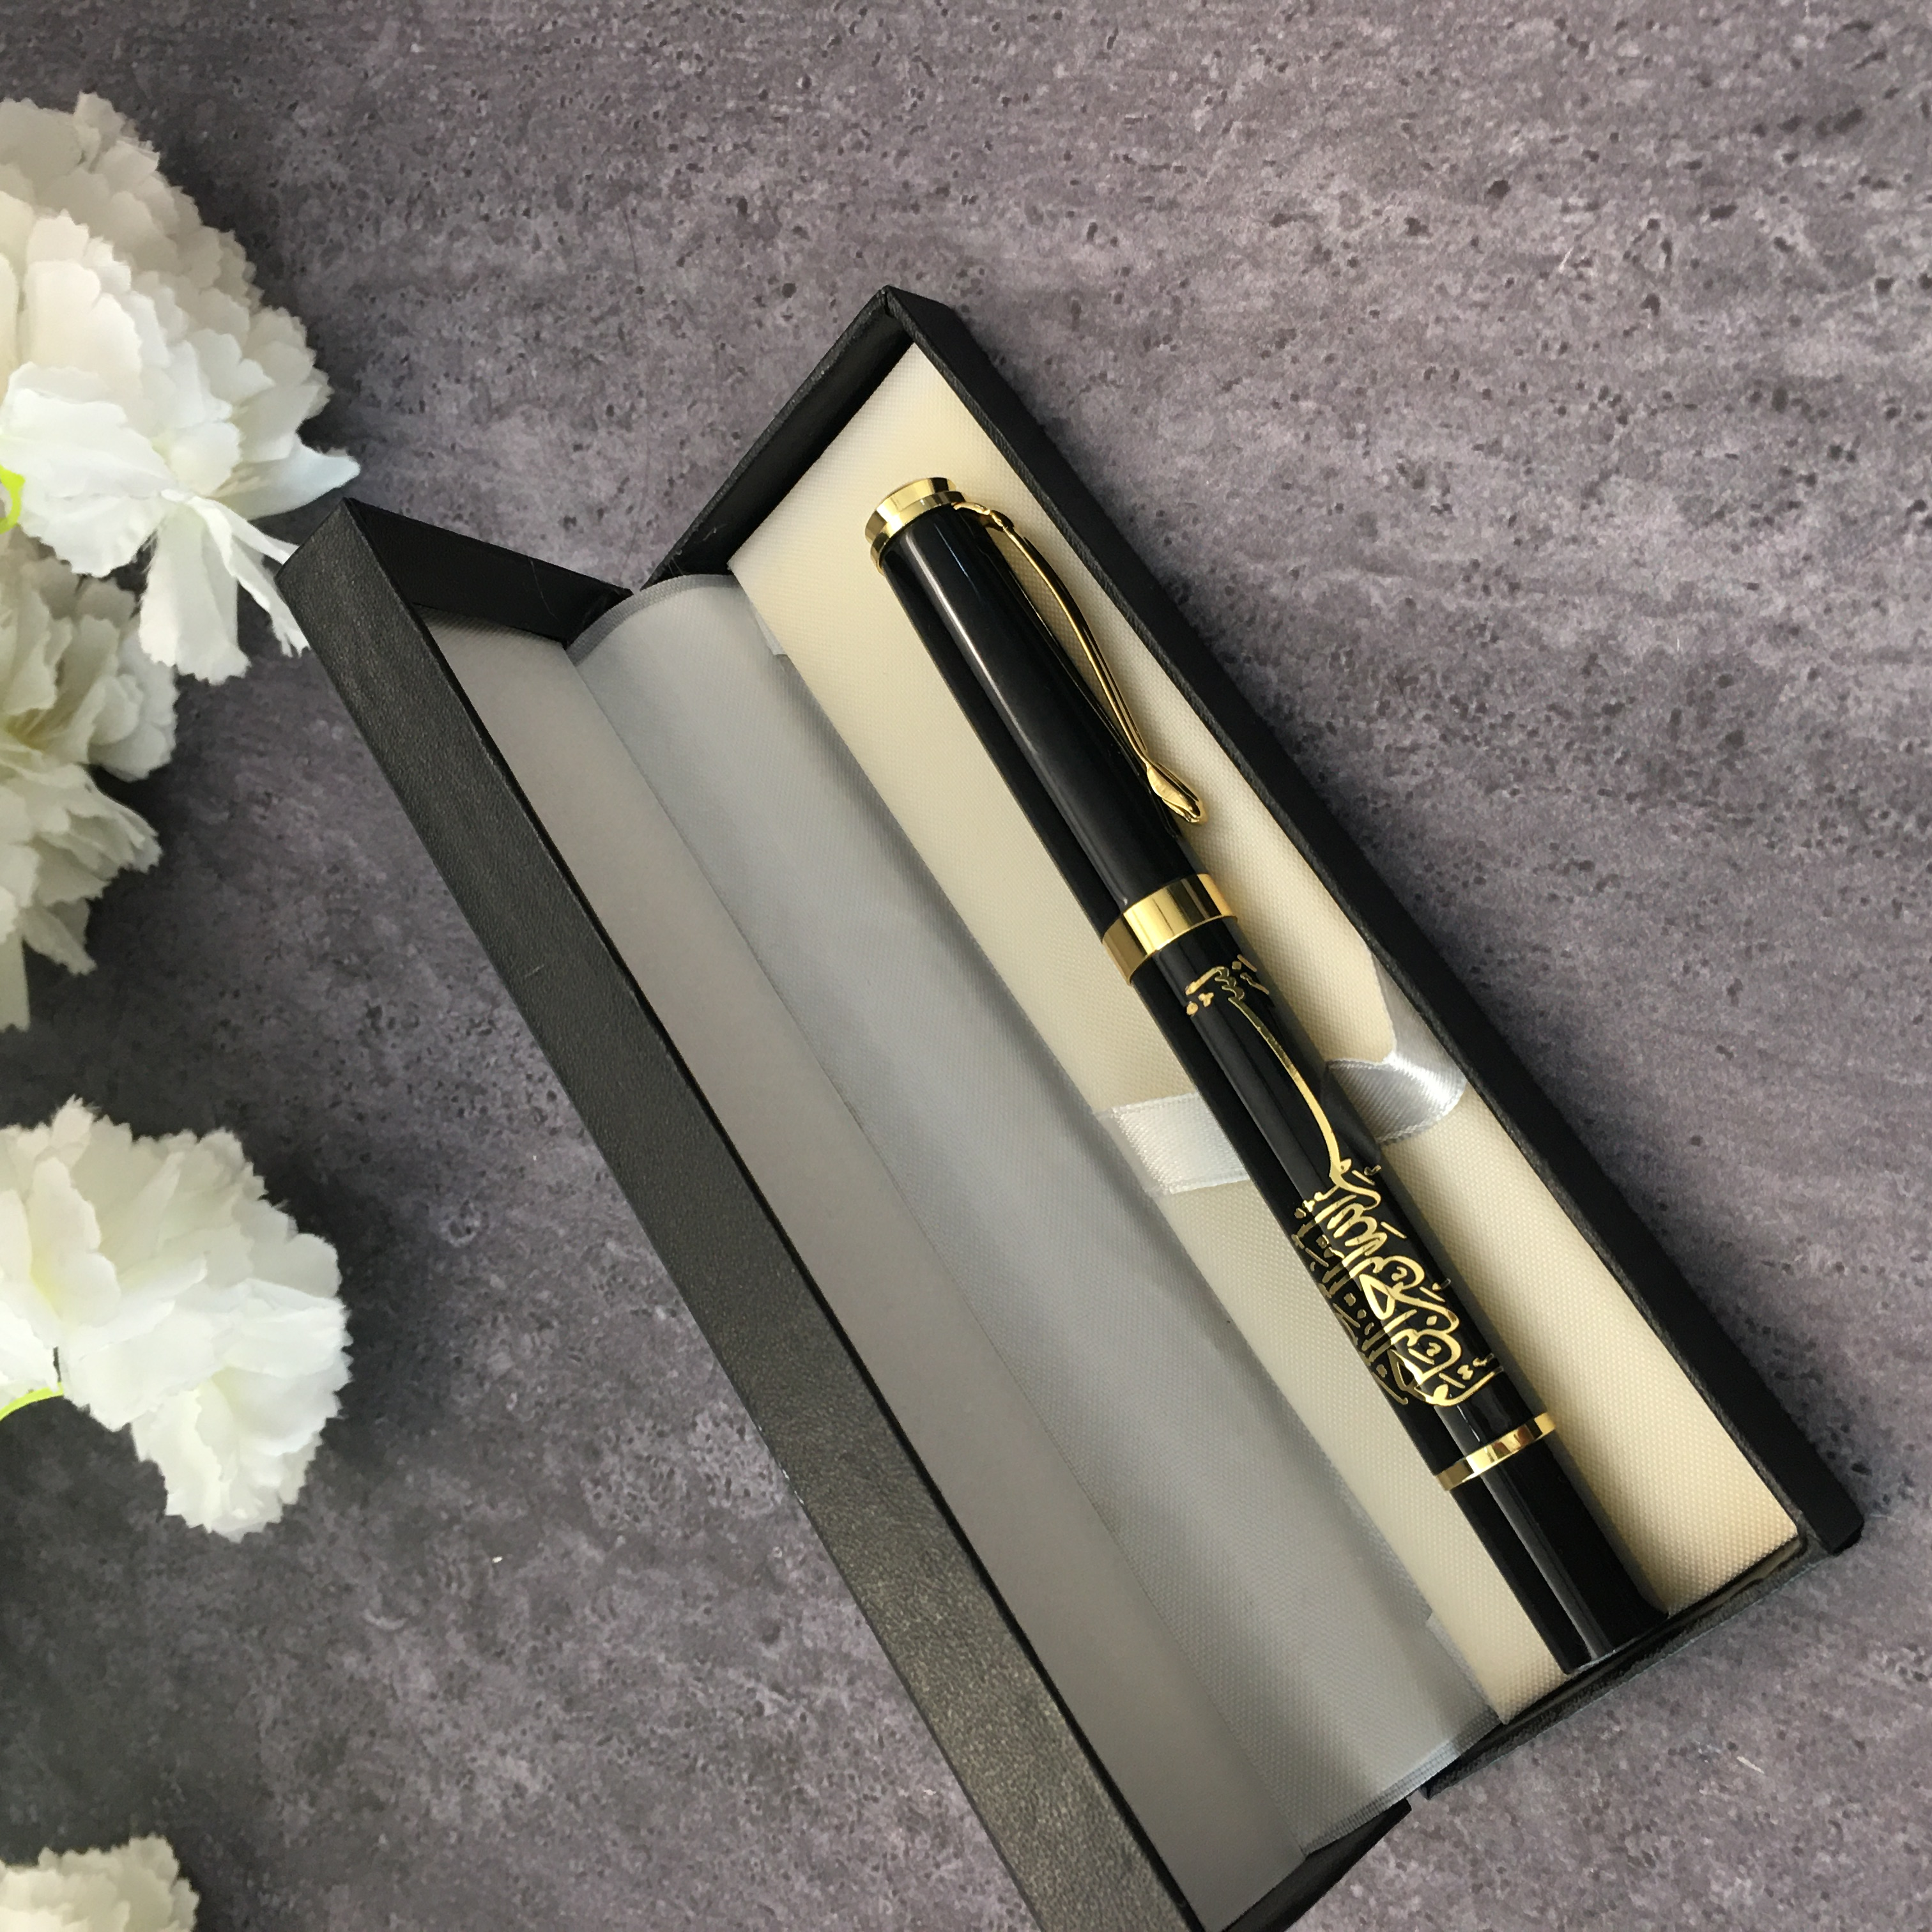 Basmala Pen Gift Set with Gold Trim Gift Muslim Father Day Favors Elegant Islamic Fancy Pen Eid Mubarak بسم الله الرحمن الرحيم